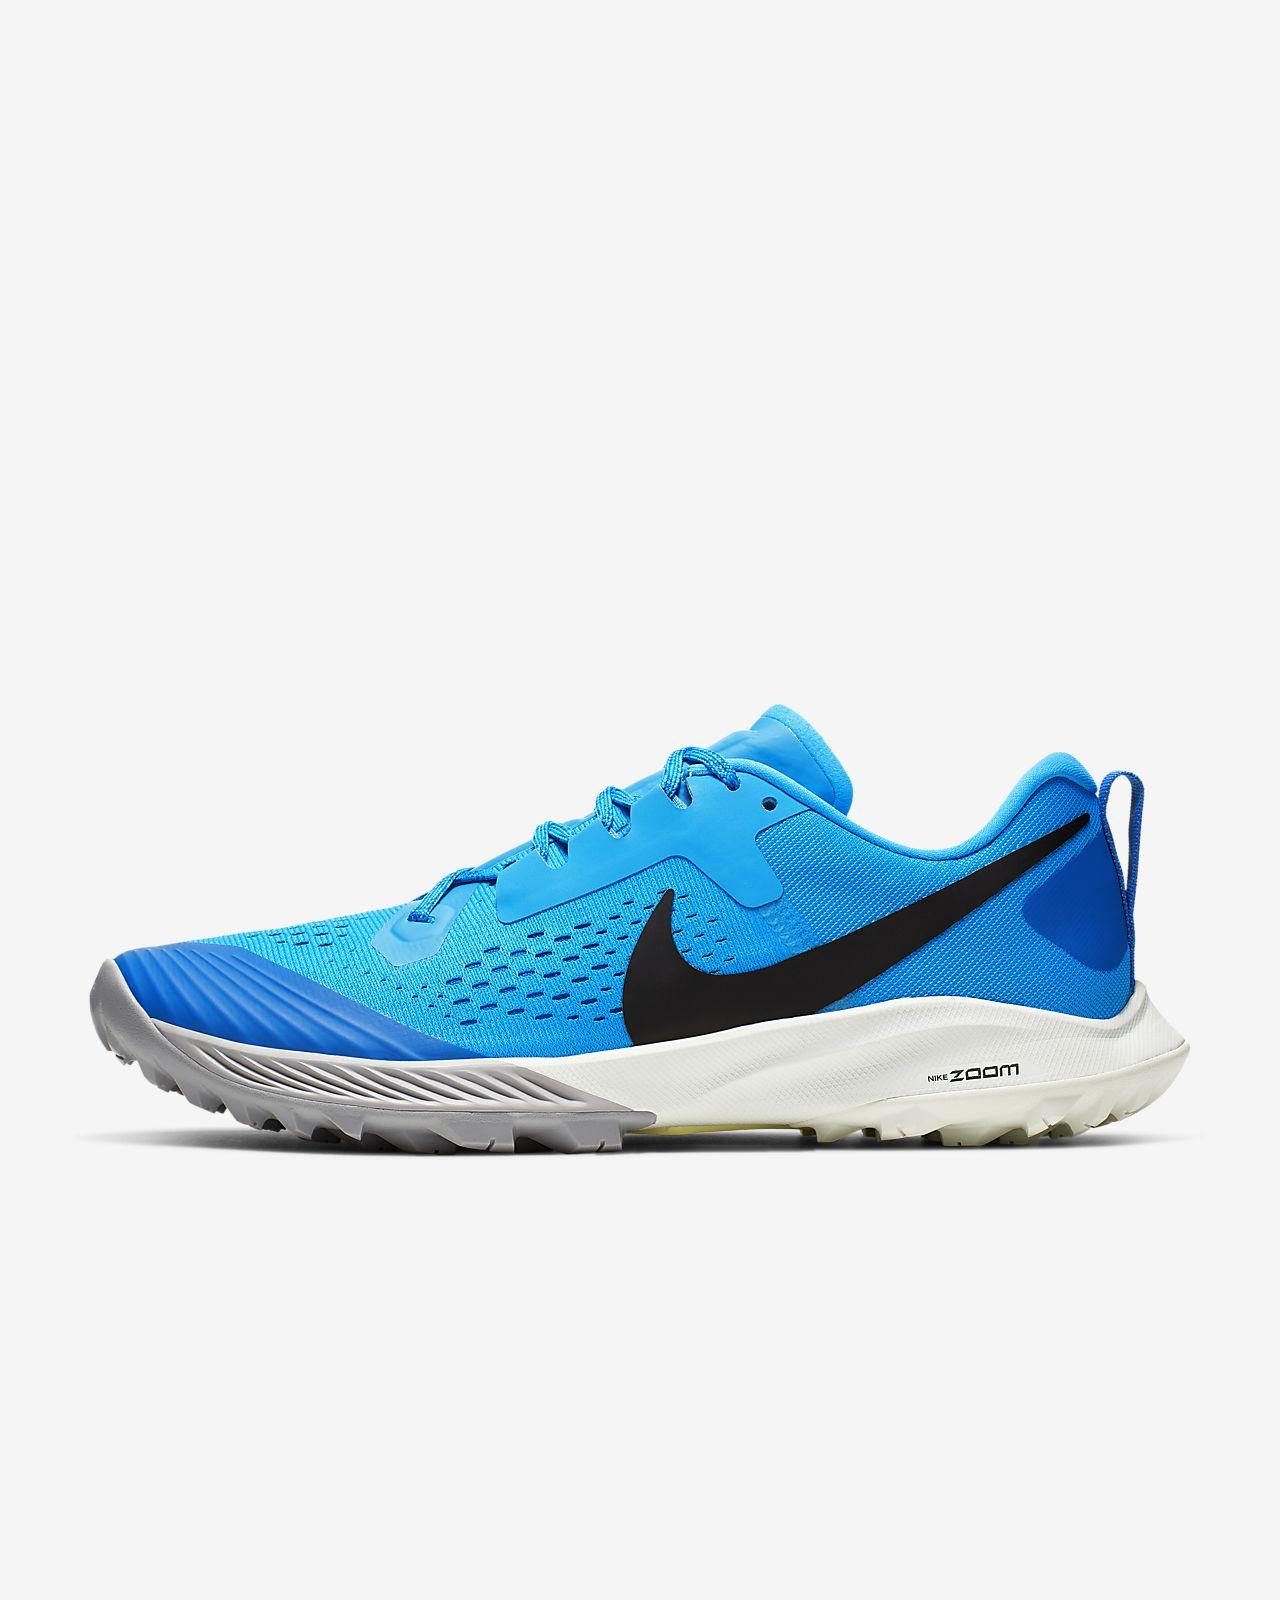 9270ea8a2 Pánská běžecká bota Nike Air Zoom Terra Kiger 5. Nike.com CZ